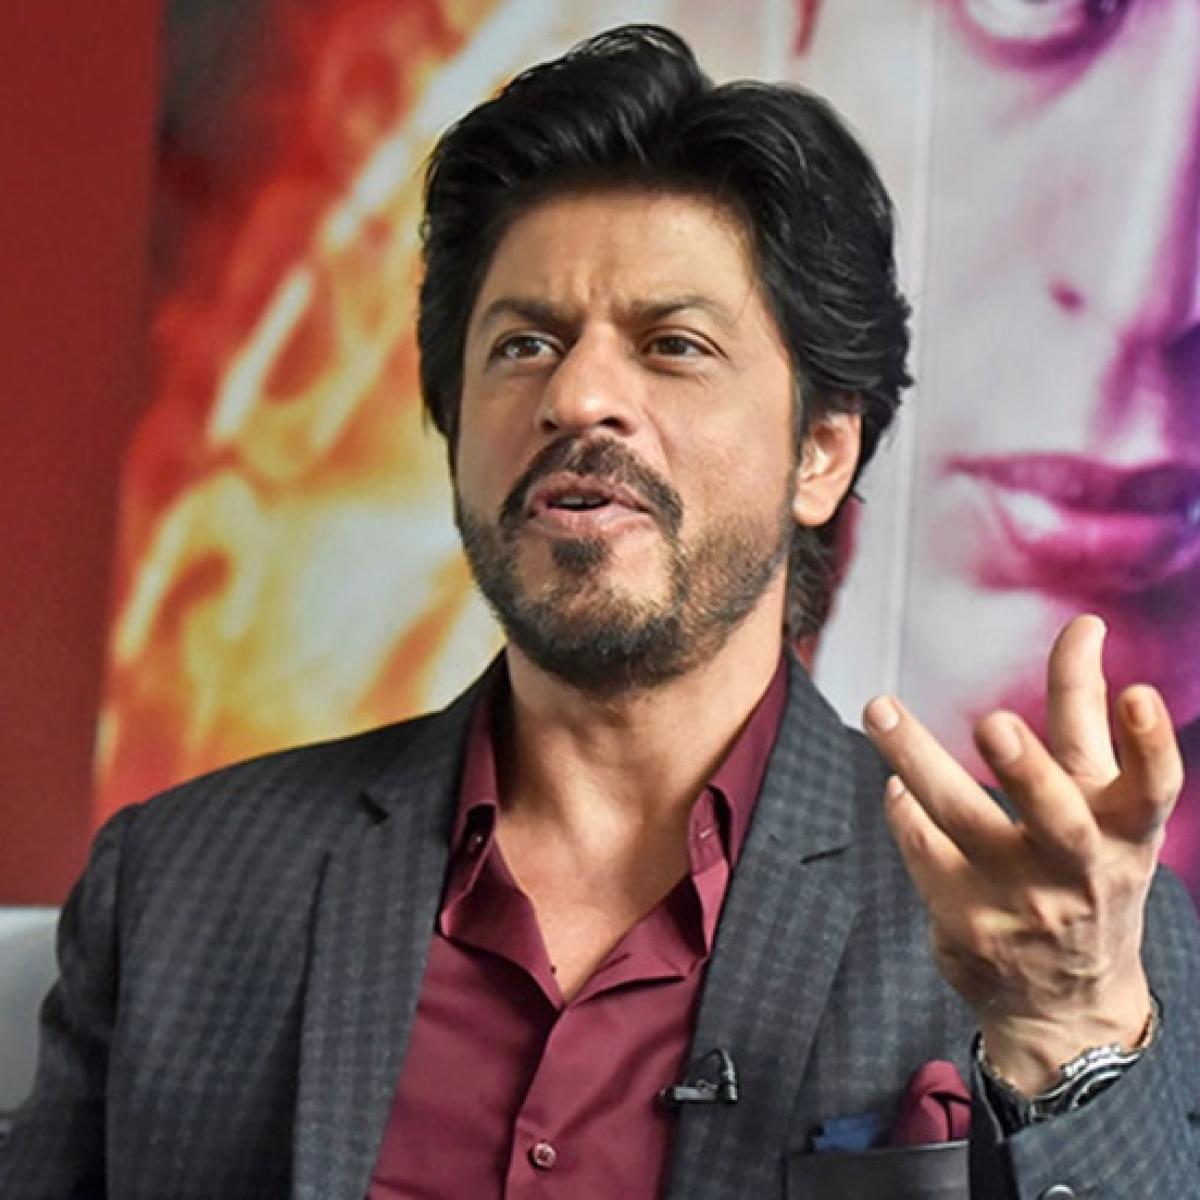 I found myself ugly: Shah Rukh Khan on the first time he saw himself onscreen